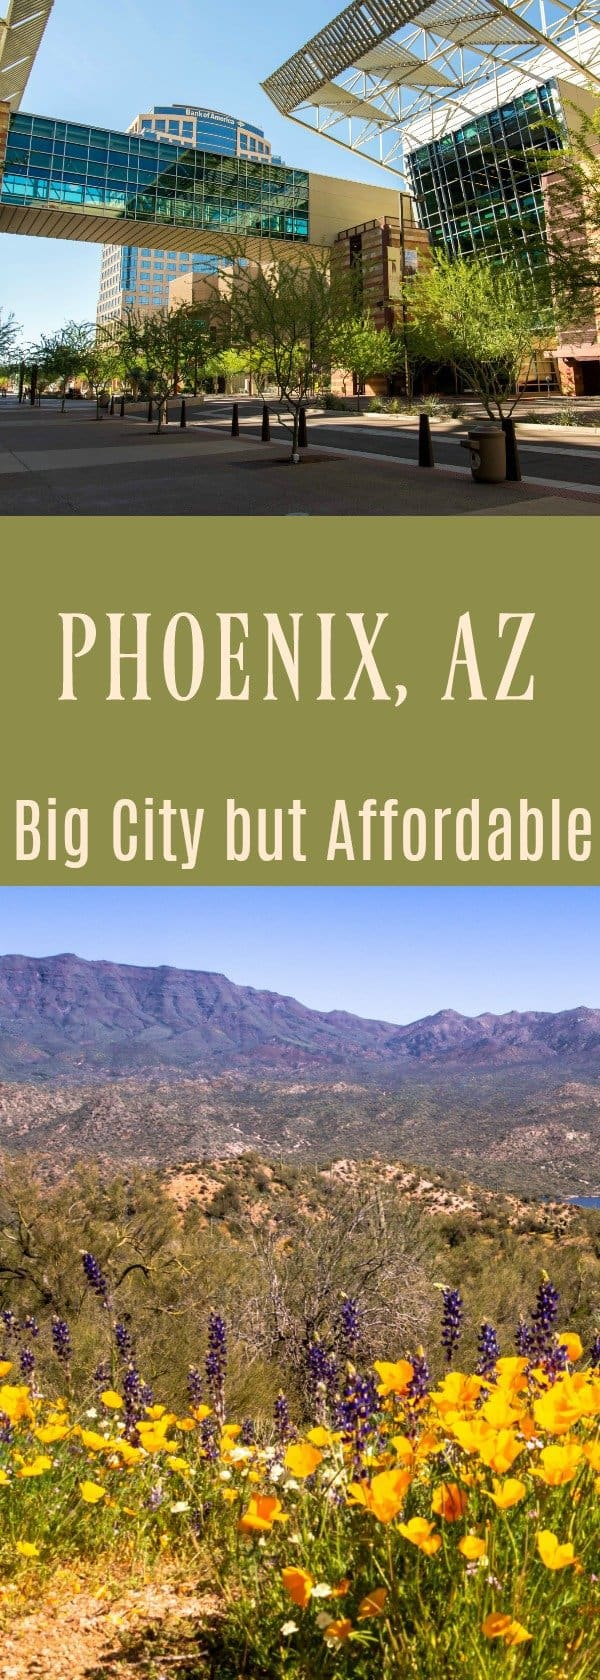 Phoenix, AZ hometown Tourist project